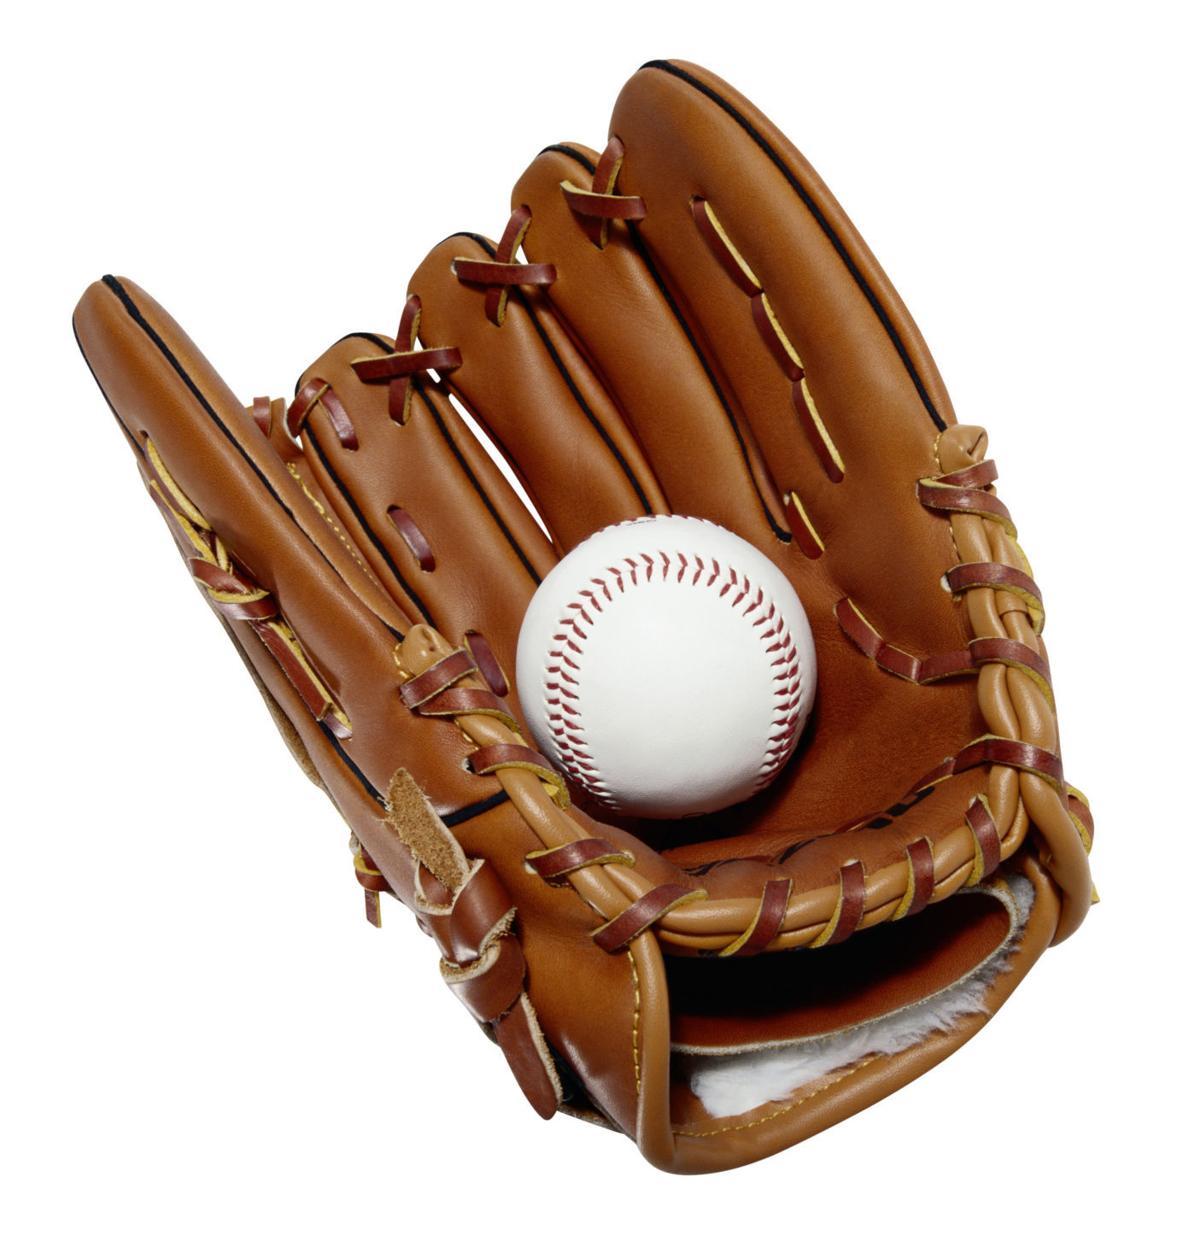 052617-blm-lif-baseballglove